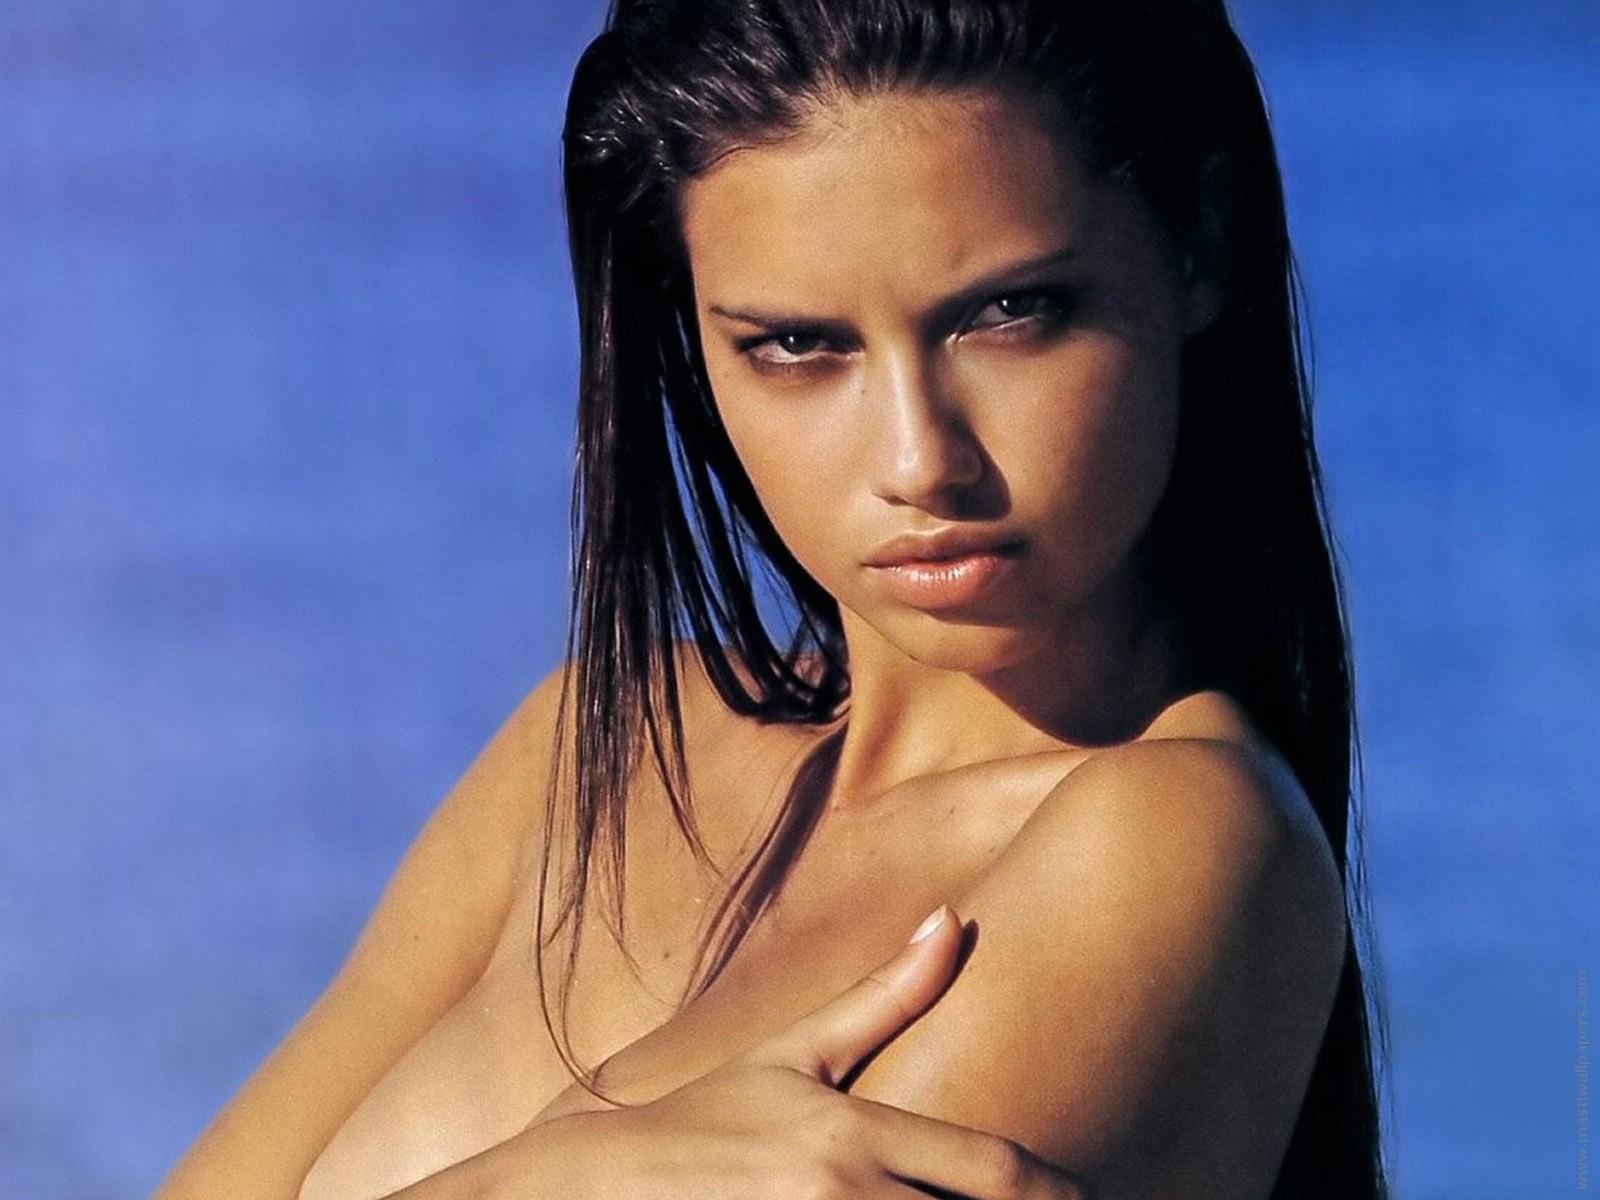 http://3.bp.blogspot.com/-WRyMOv20BeQ/T0z7odp6bFI/AAAAAAAAM3k/jk6VmgeJI4s/s1600/Adriana+Lima+Hot+(3).jpg